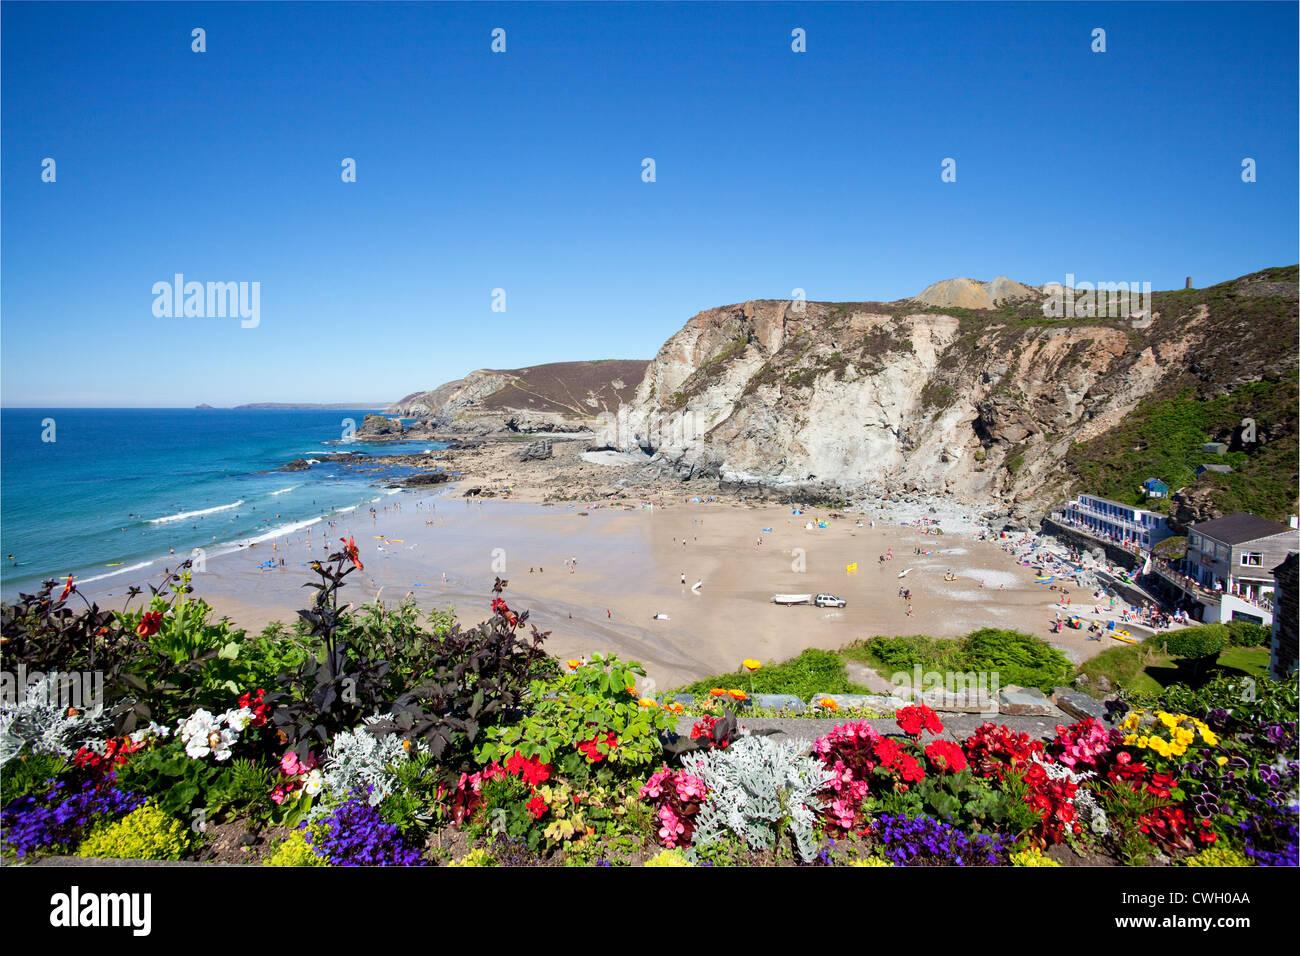 Trevaunance Cove, St Agnes, Cornwall, UK - Stock Image